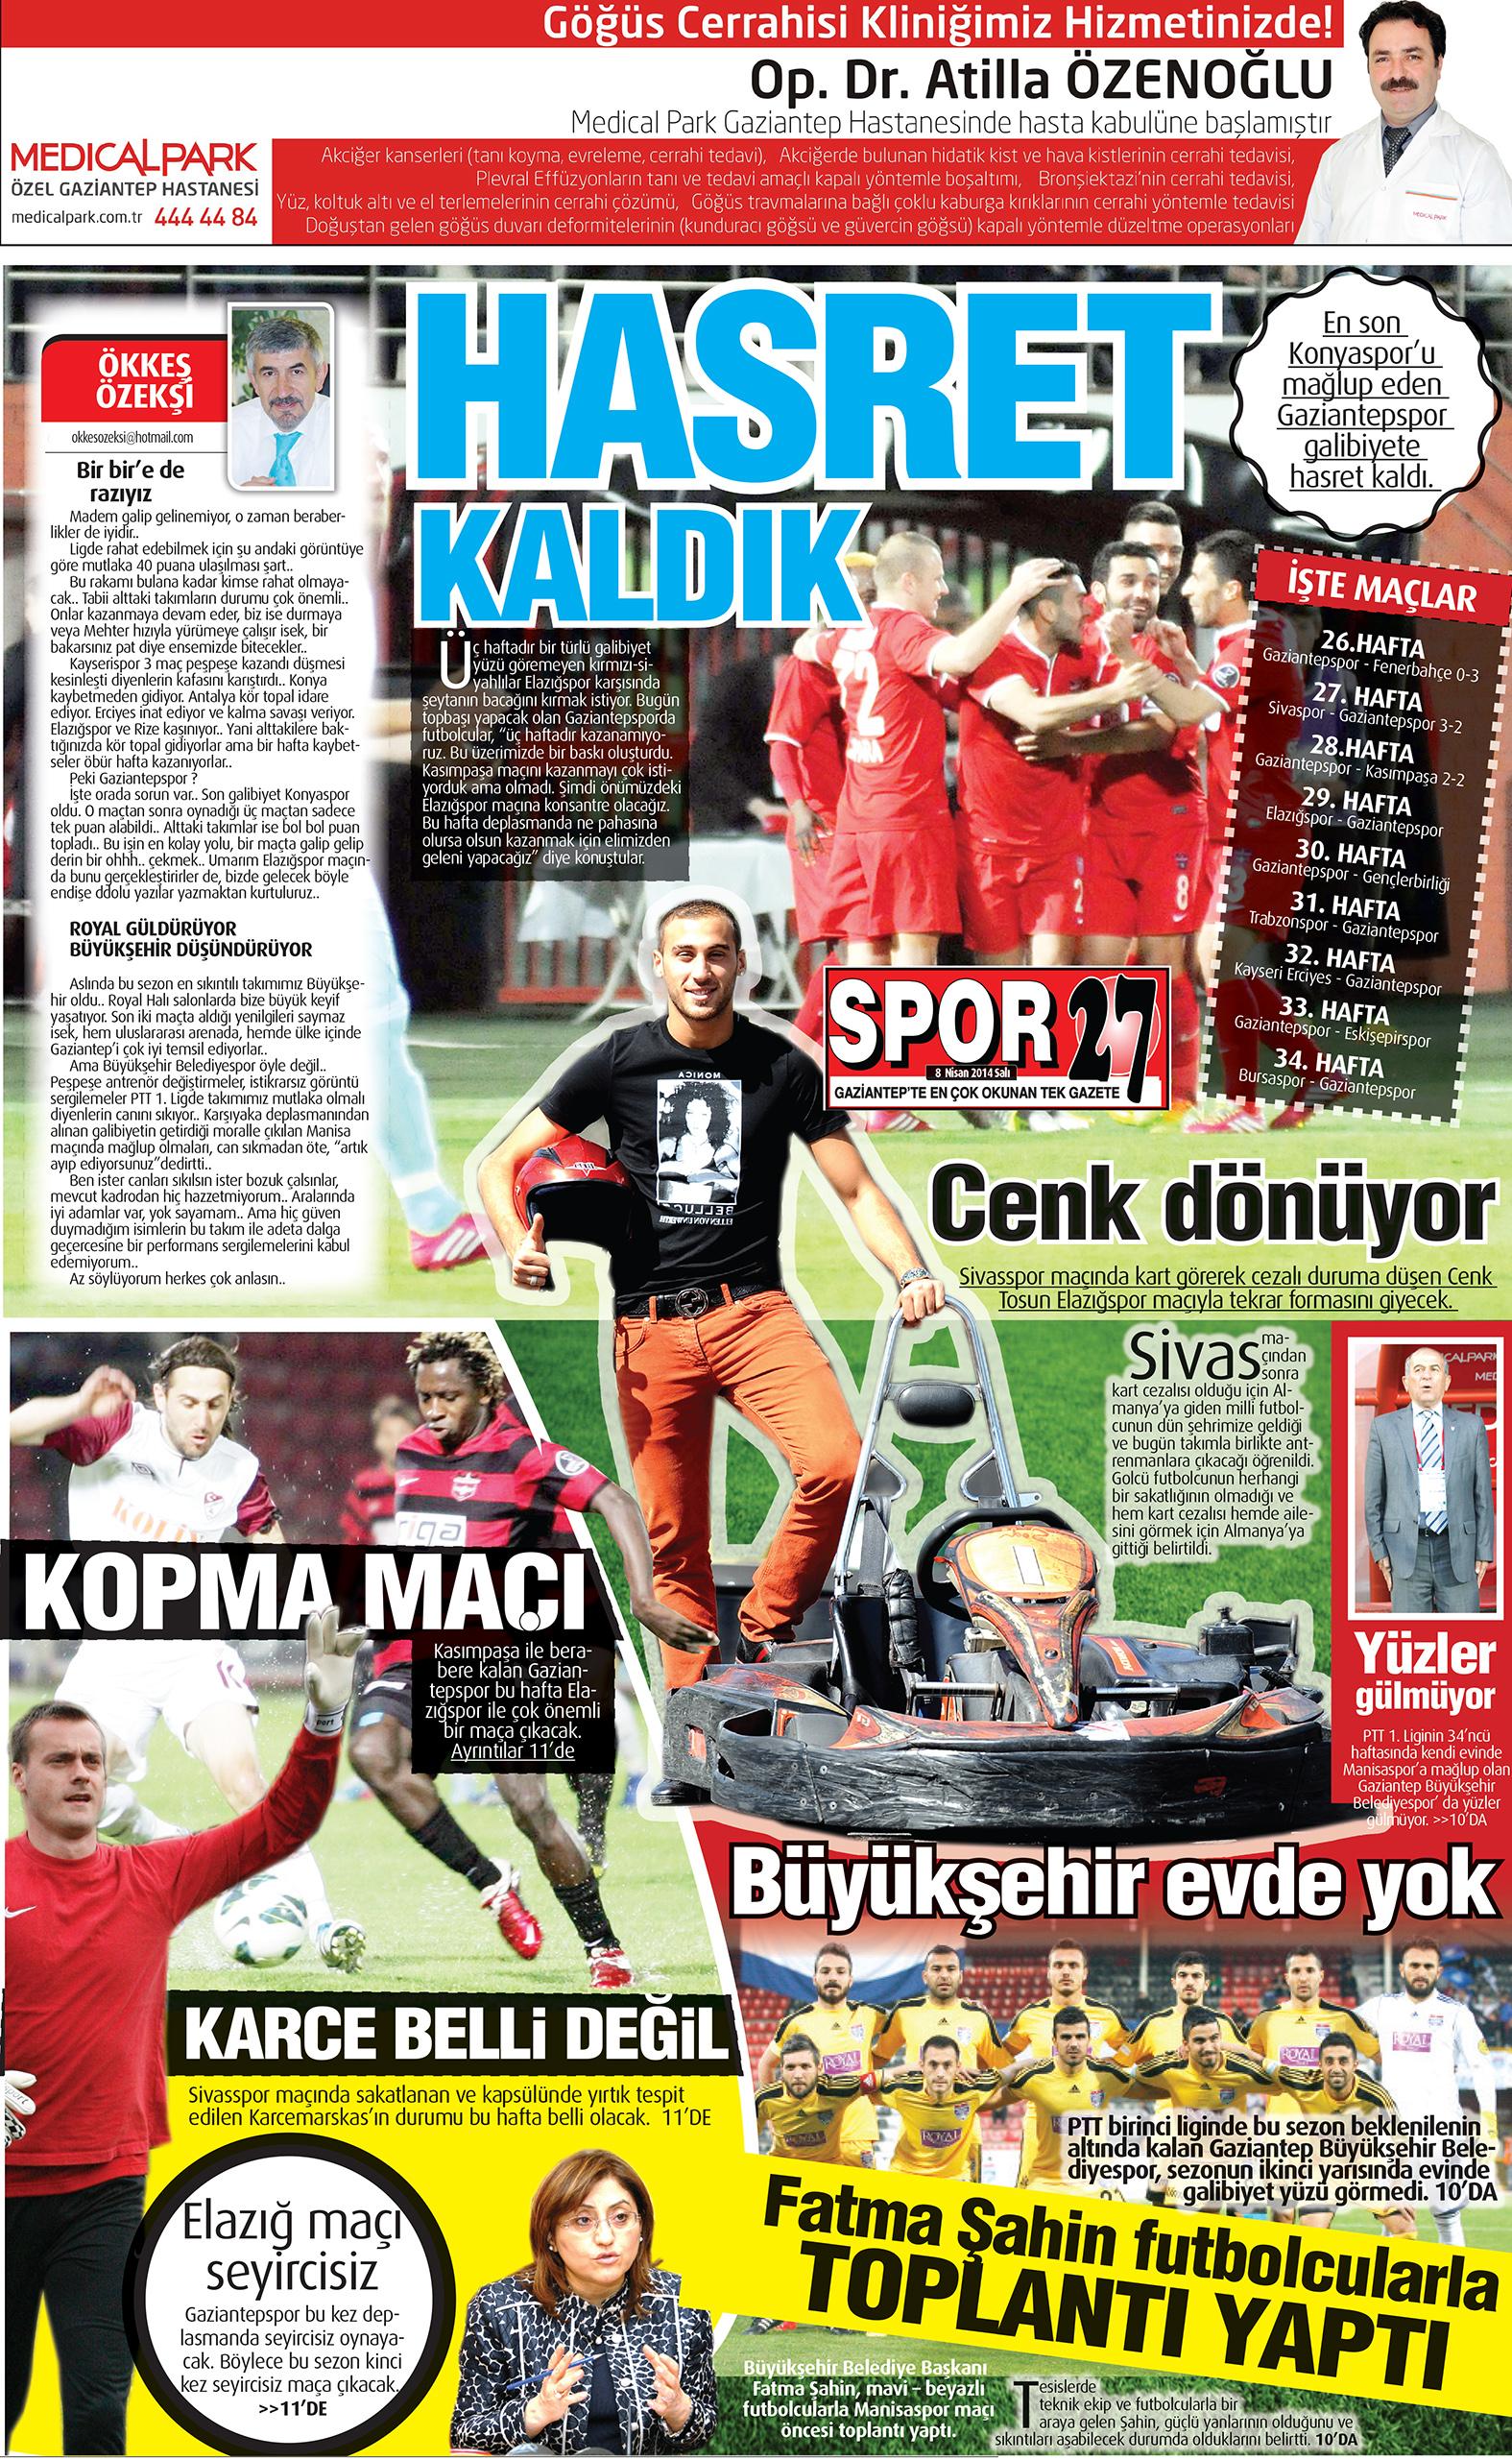 8 Nisan 2014 sayfalar 2